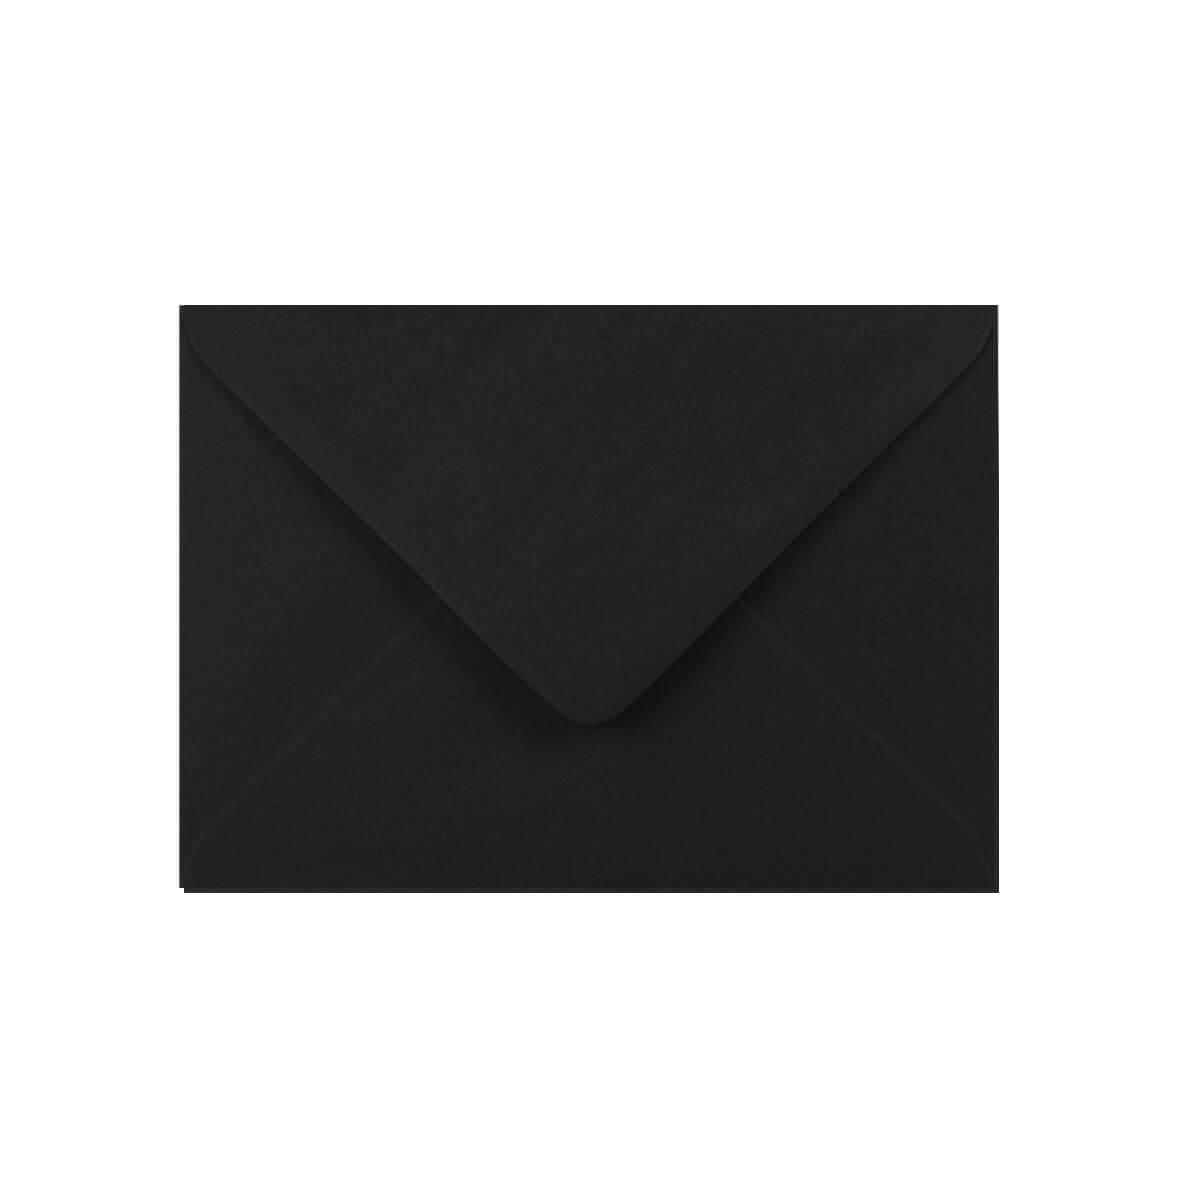 C4 BLACK ENVELOPES 120GSM